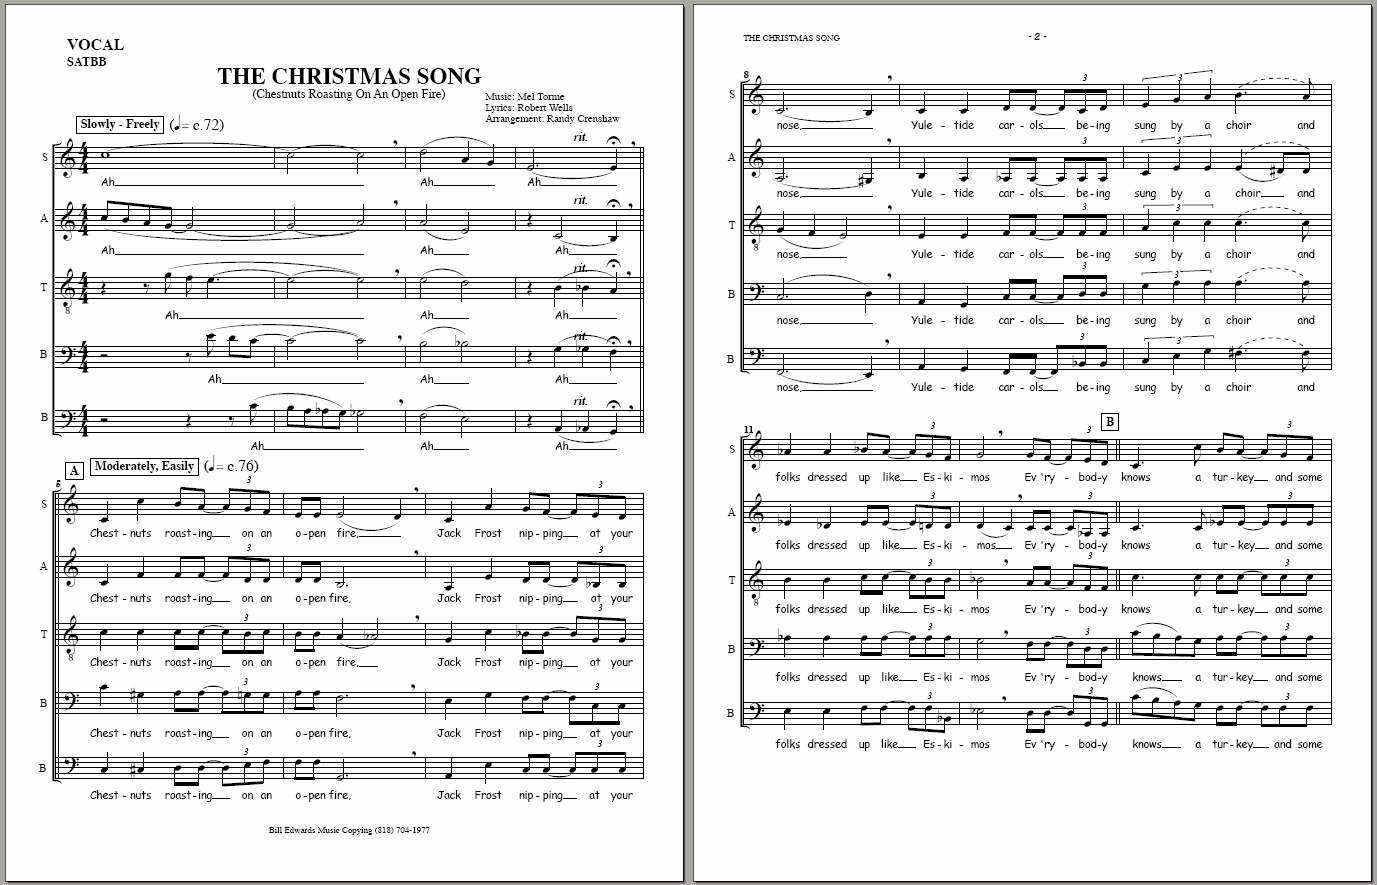 CHARTS | Randy Crenshaw